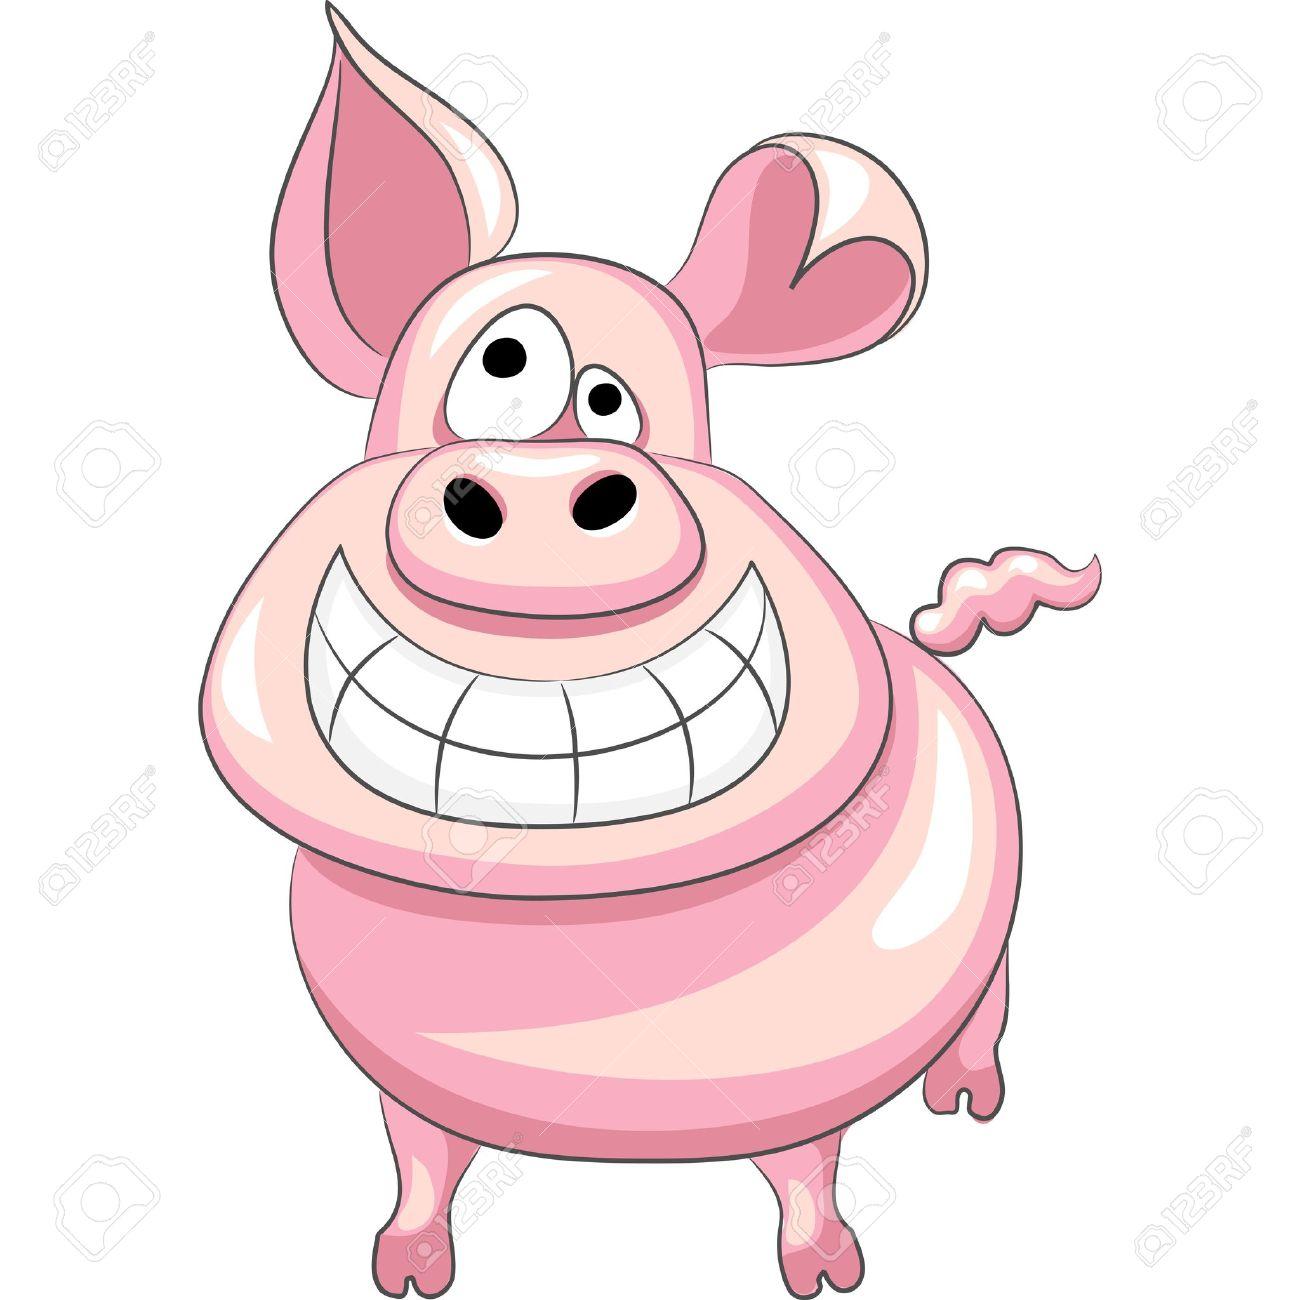 funny cartoon happy pig smile Stock Vector - 12000365